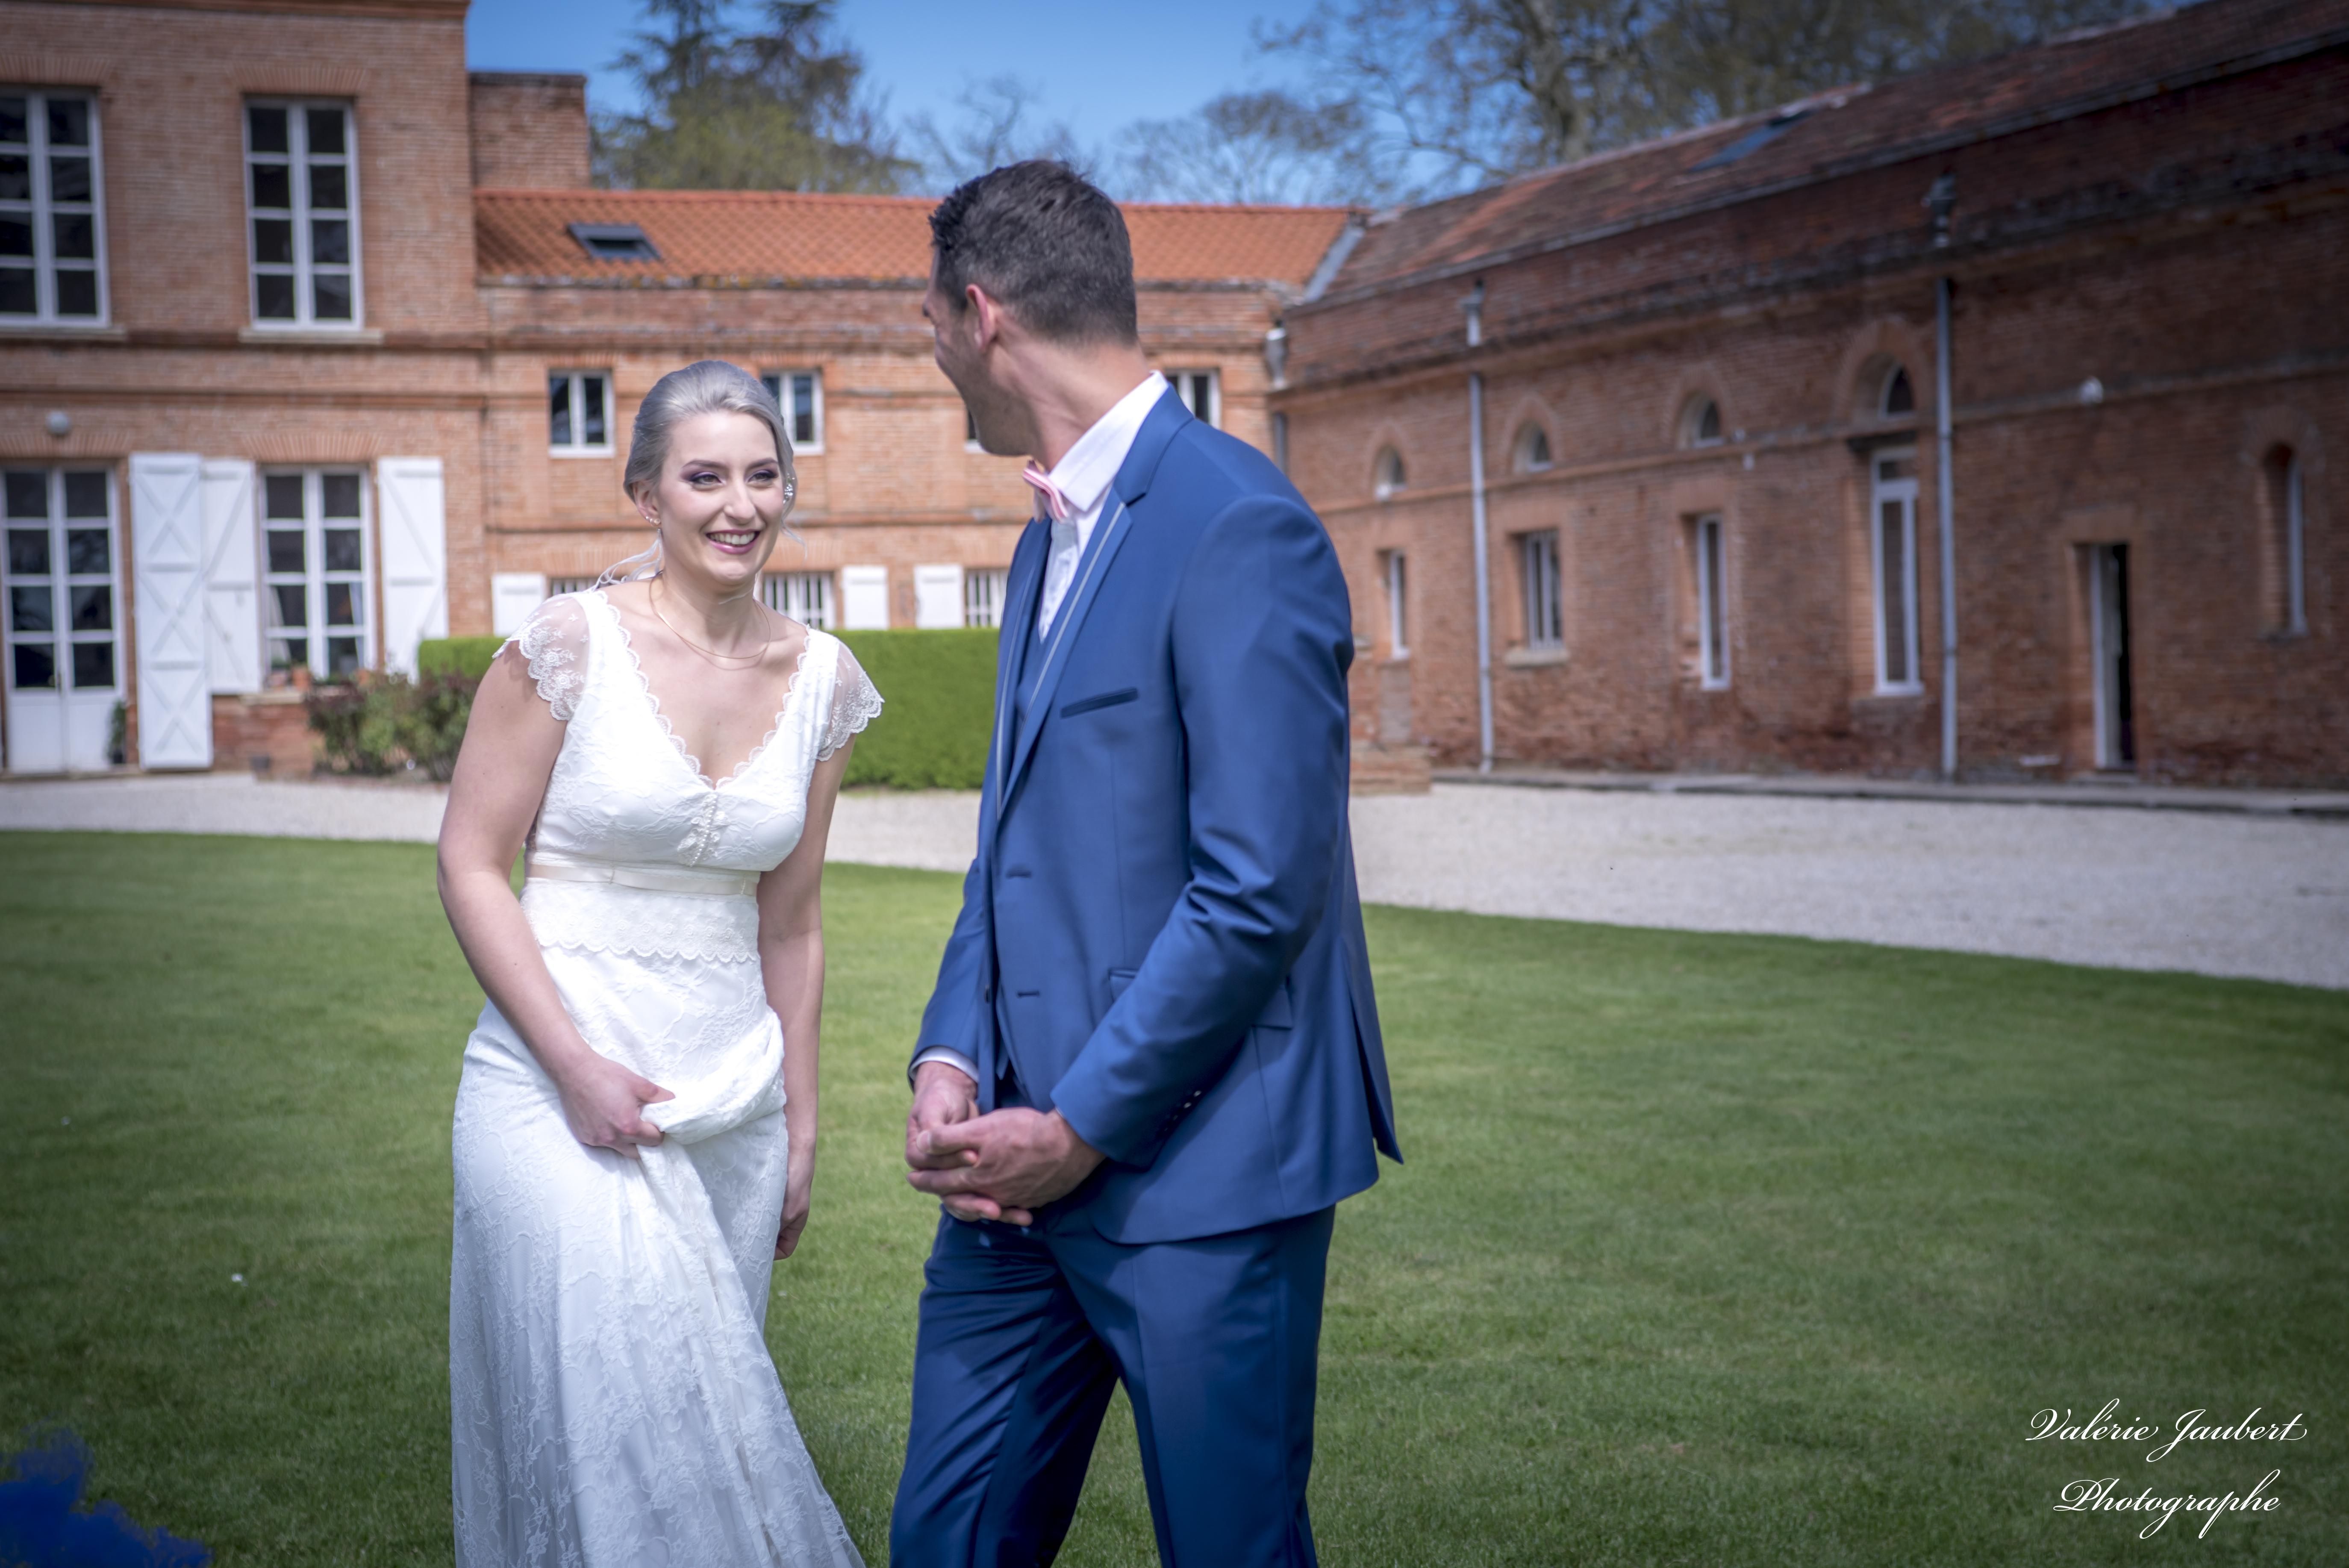 valerie-jaubert-chateau-lavalade-tarn-et-garonne-mariage-reception